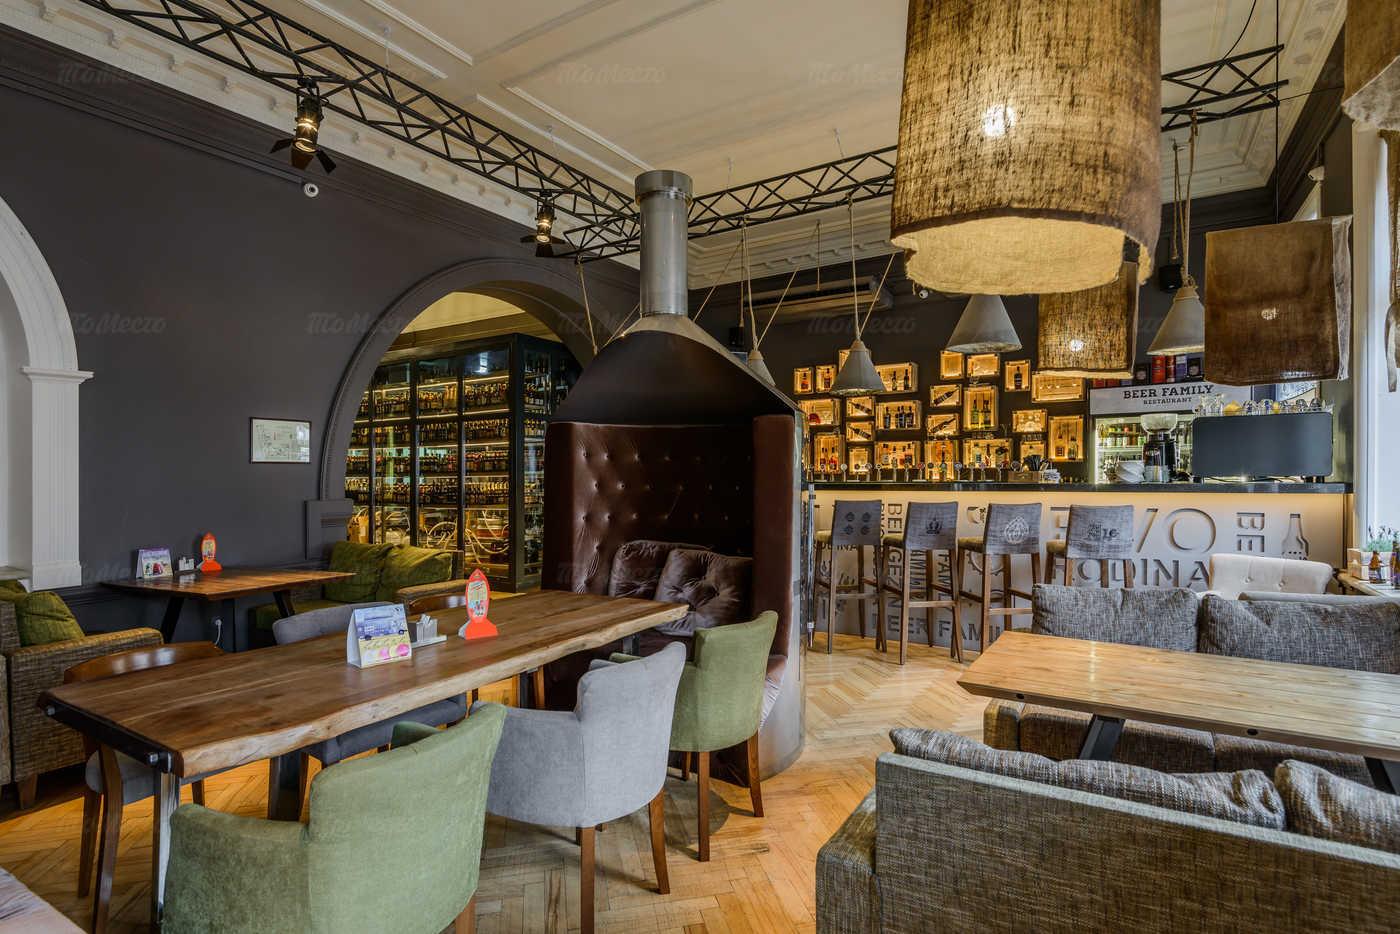 Ресторан Шато Винтаж (Chateau Vintage) на Невском проспекте фото 19